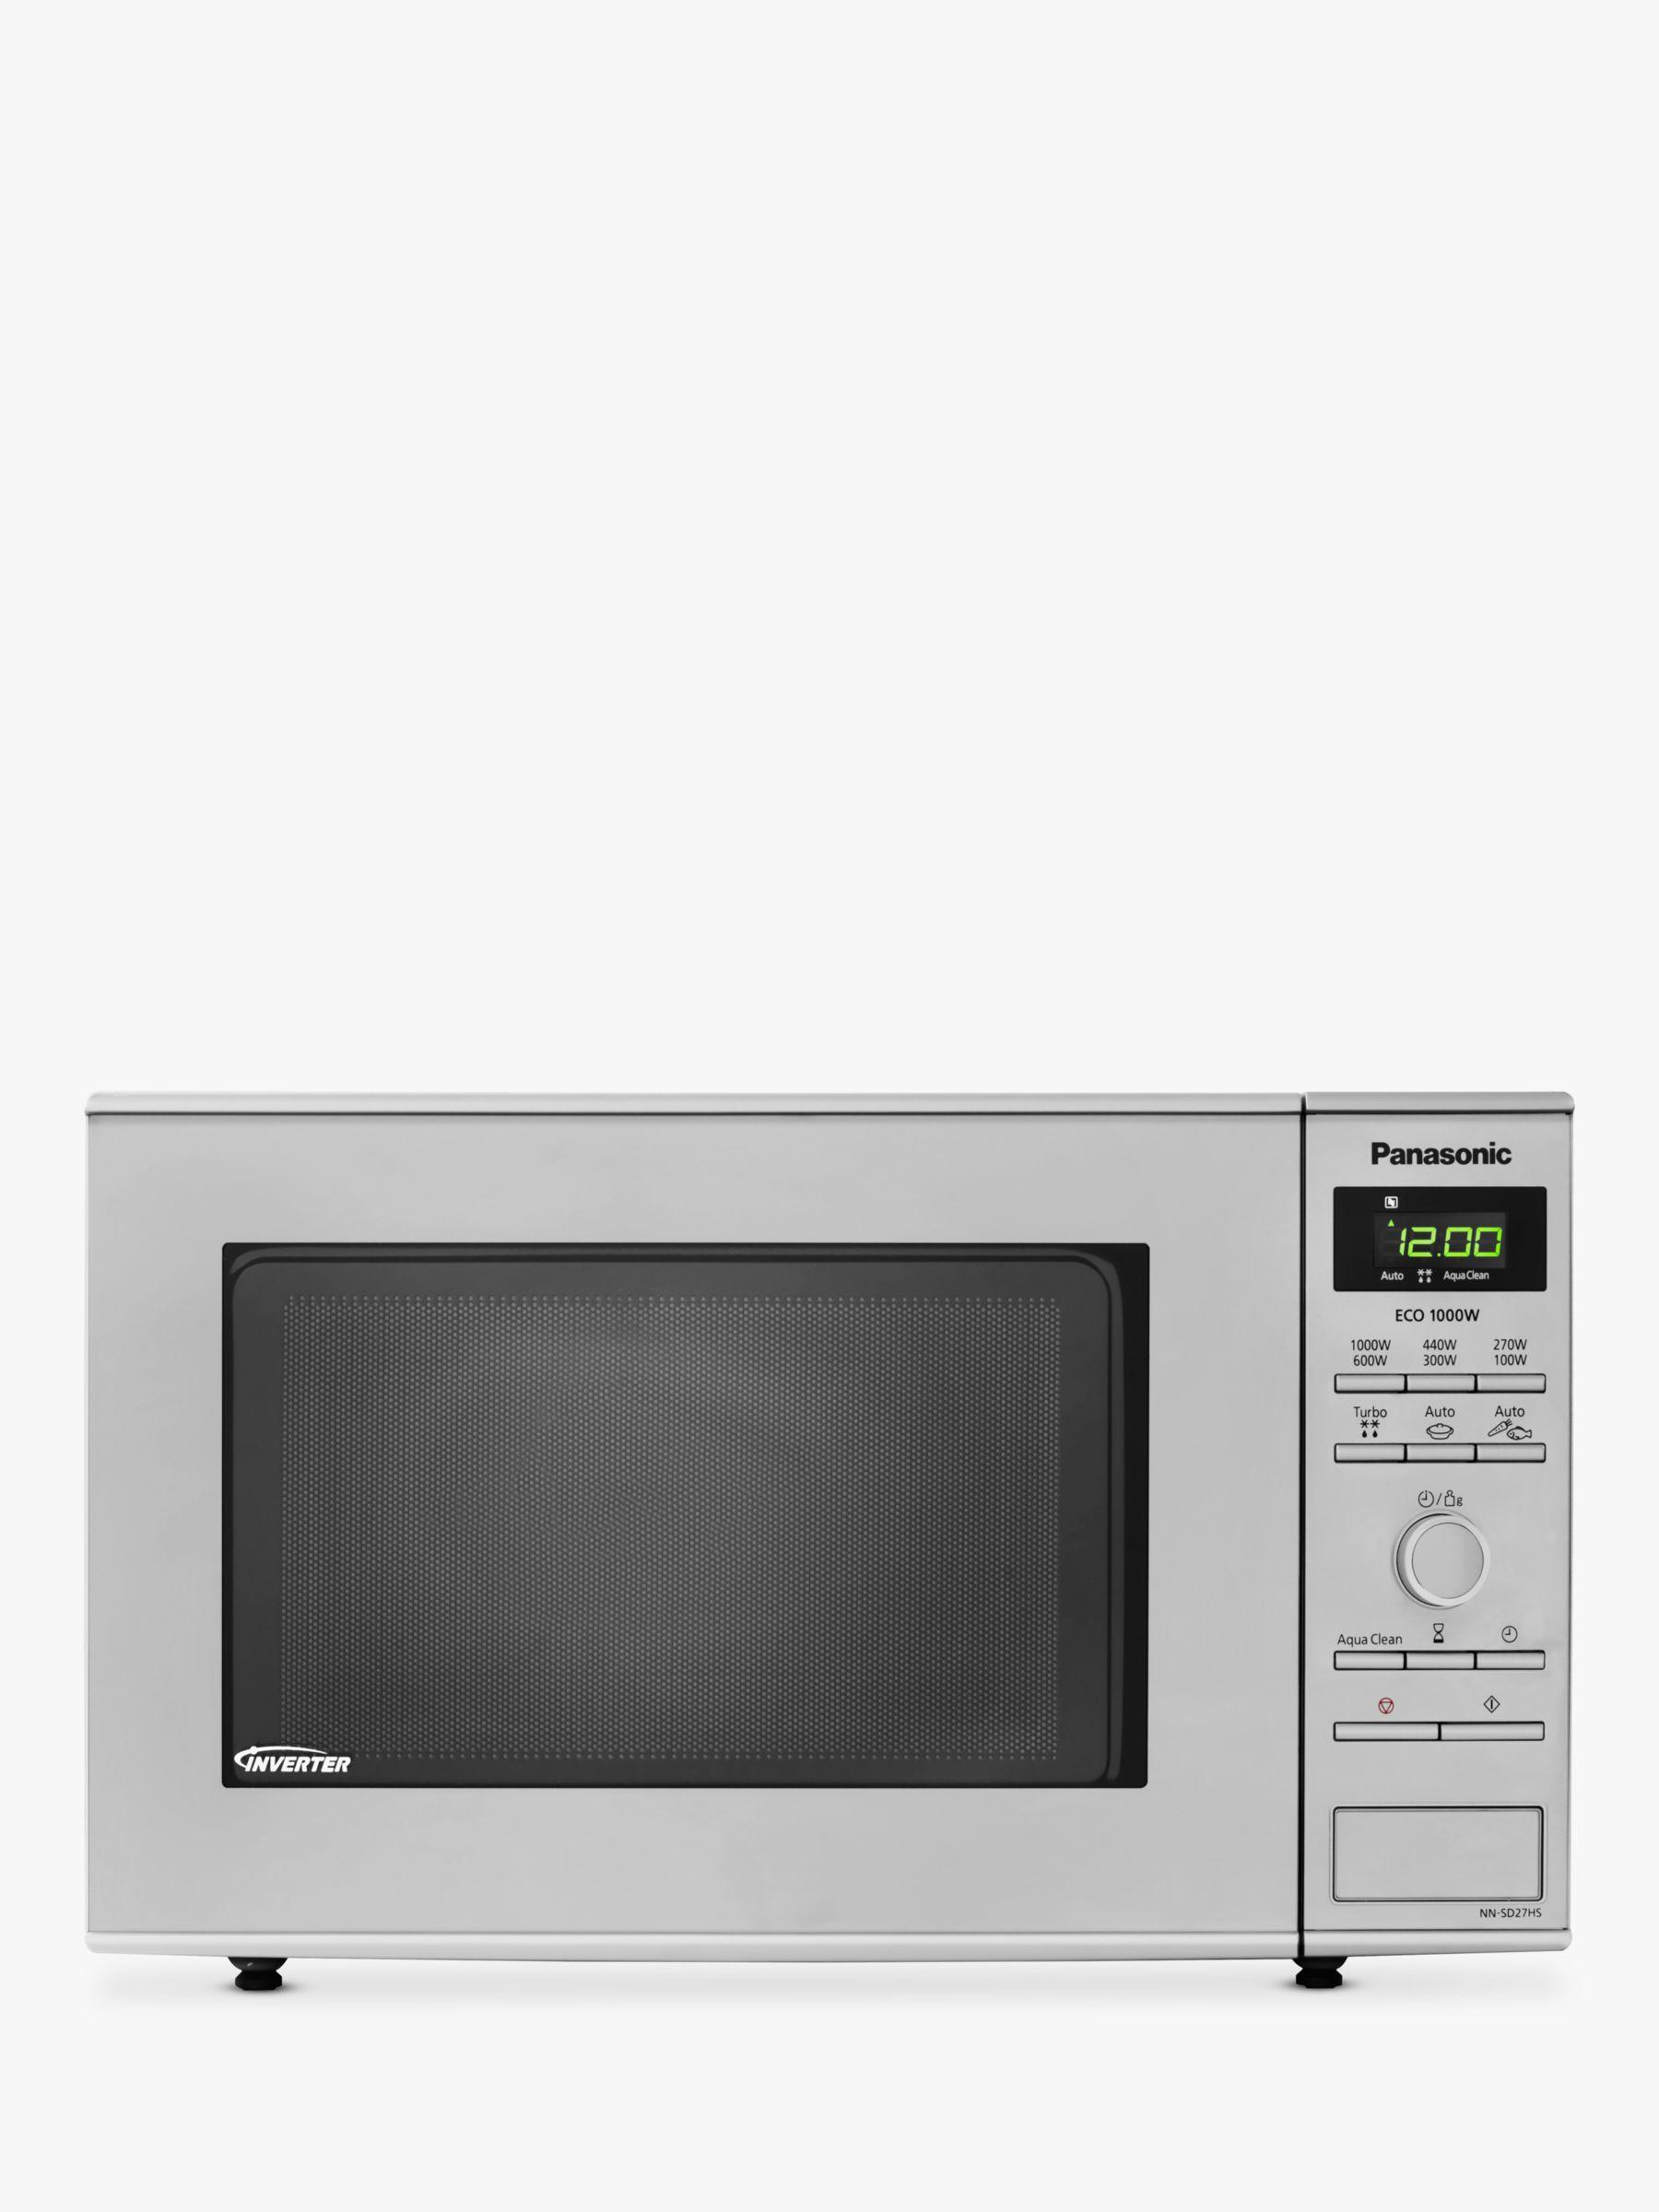 Panasonic Panasonic NN-SD27HSBPQ Microwave, Stainless Steel